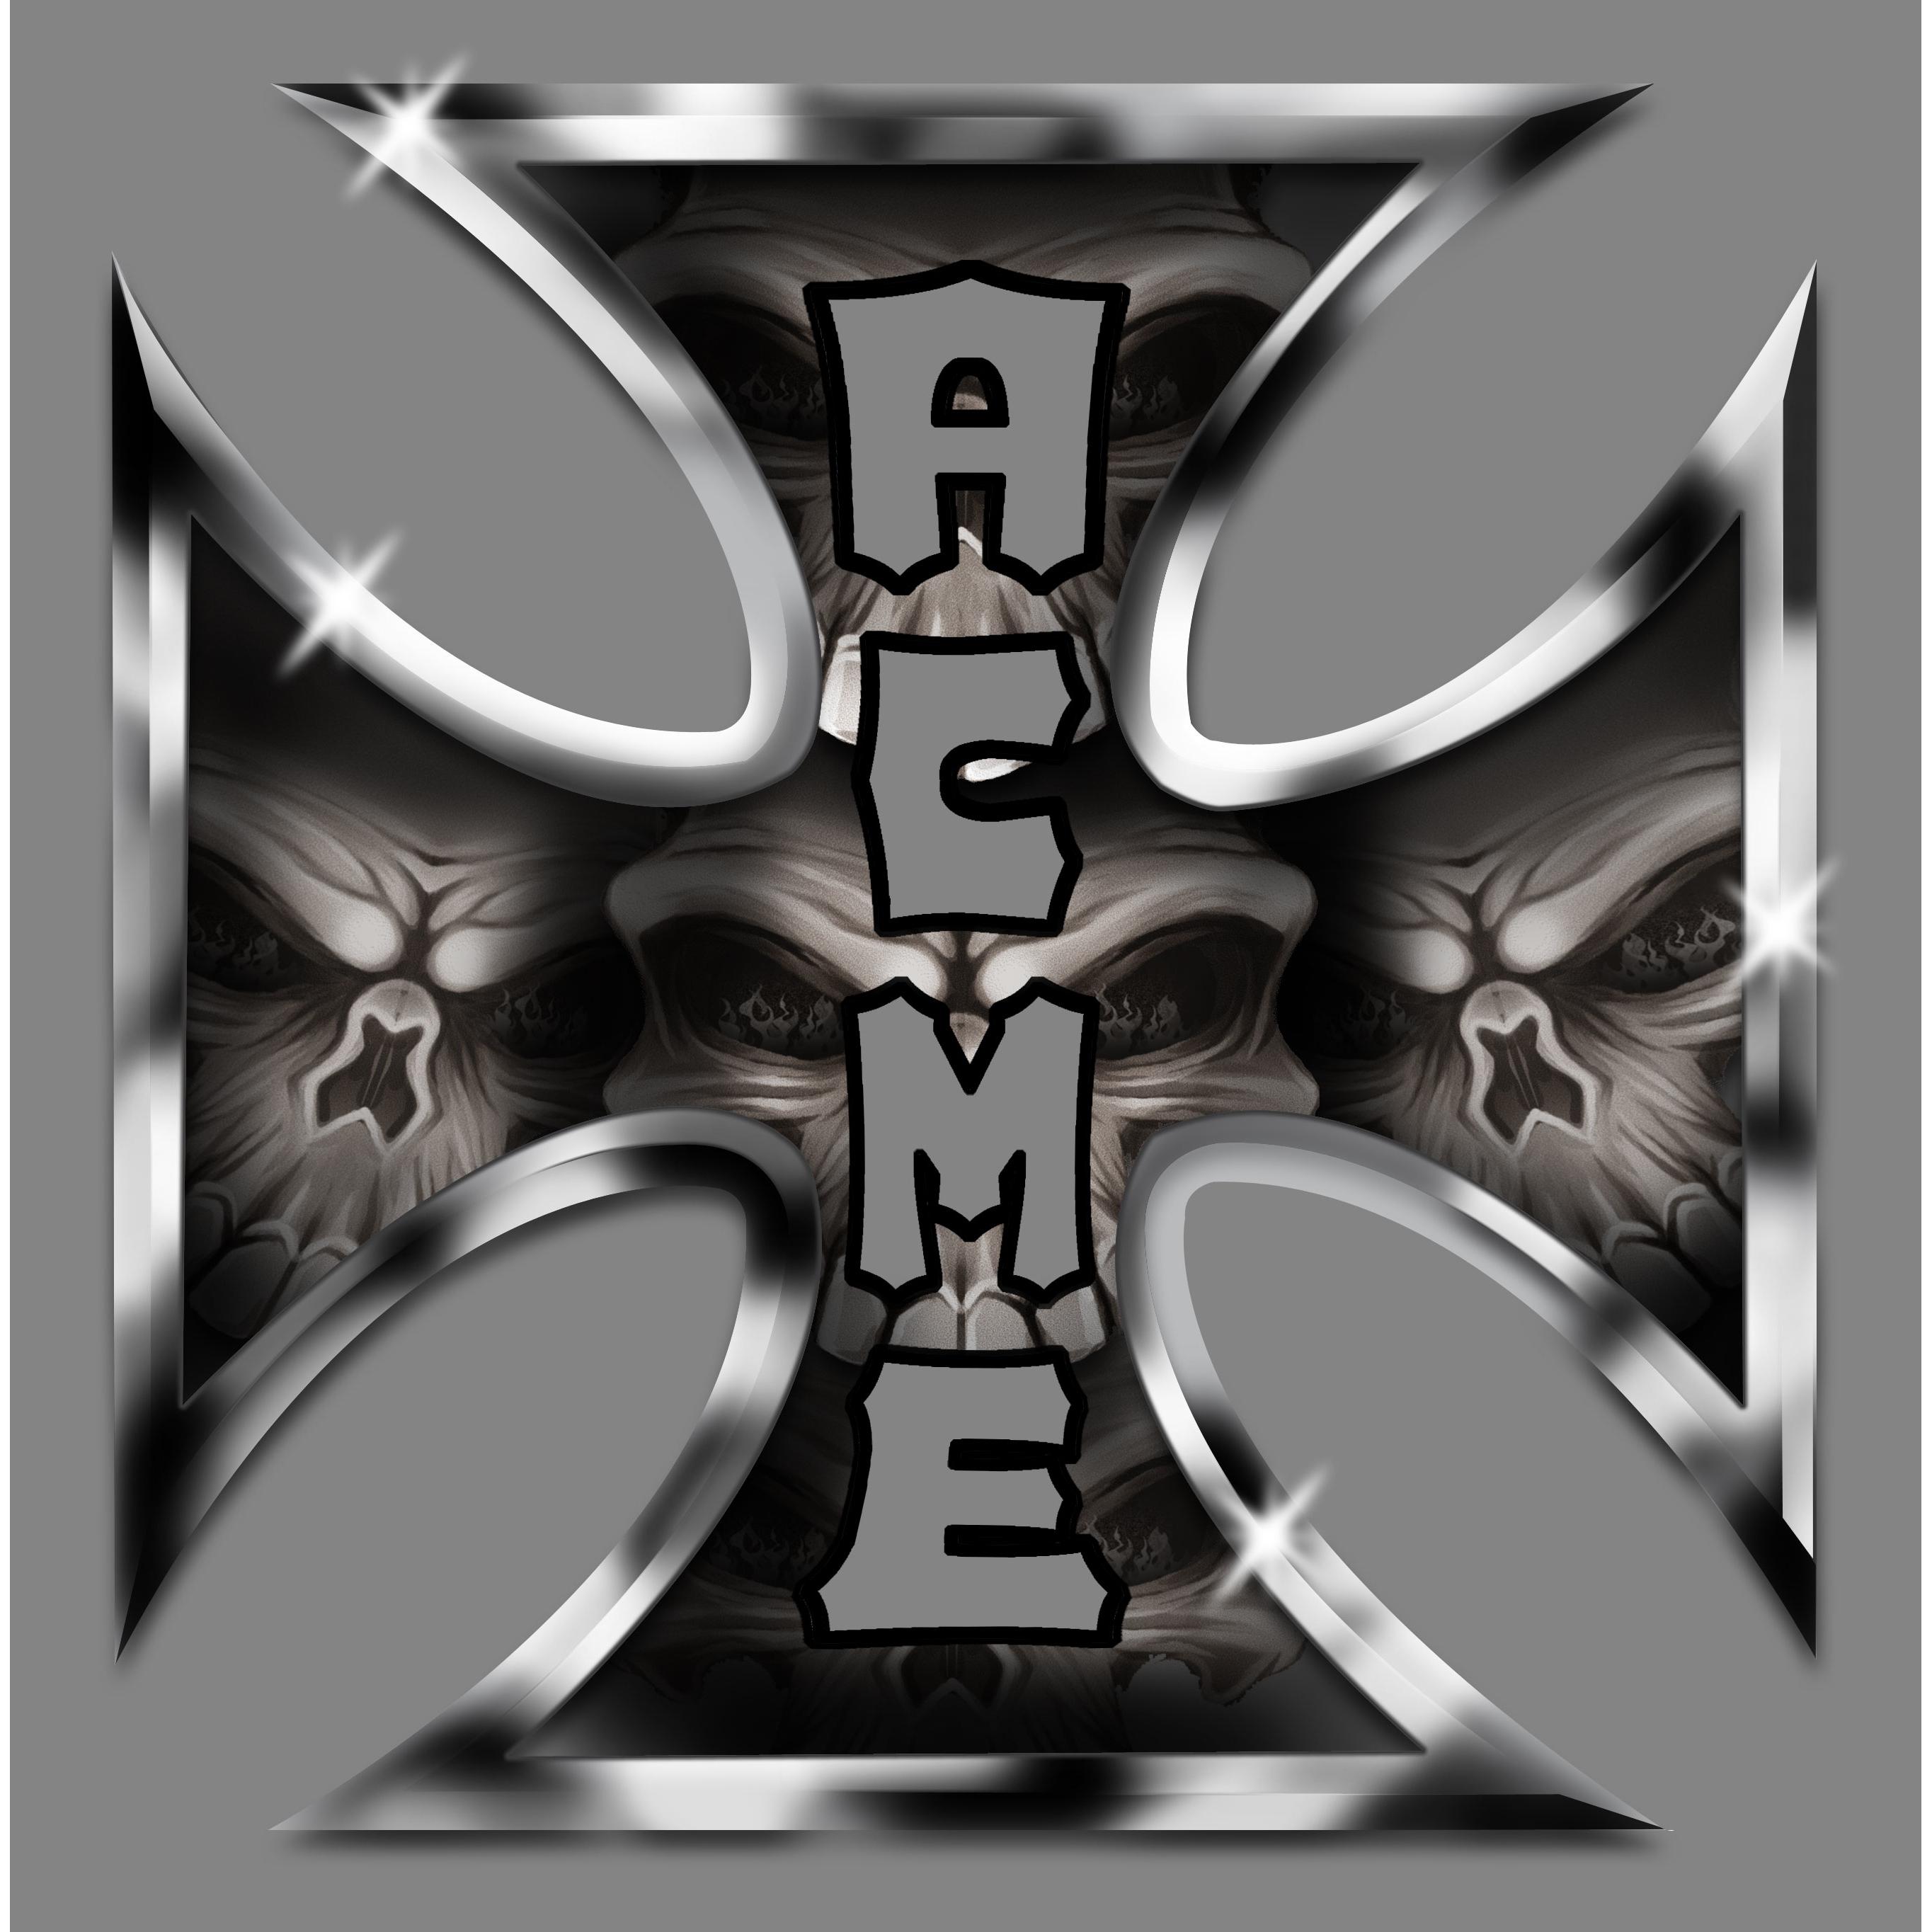 Acme Radiator and Heavy Equipment